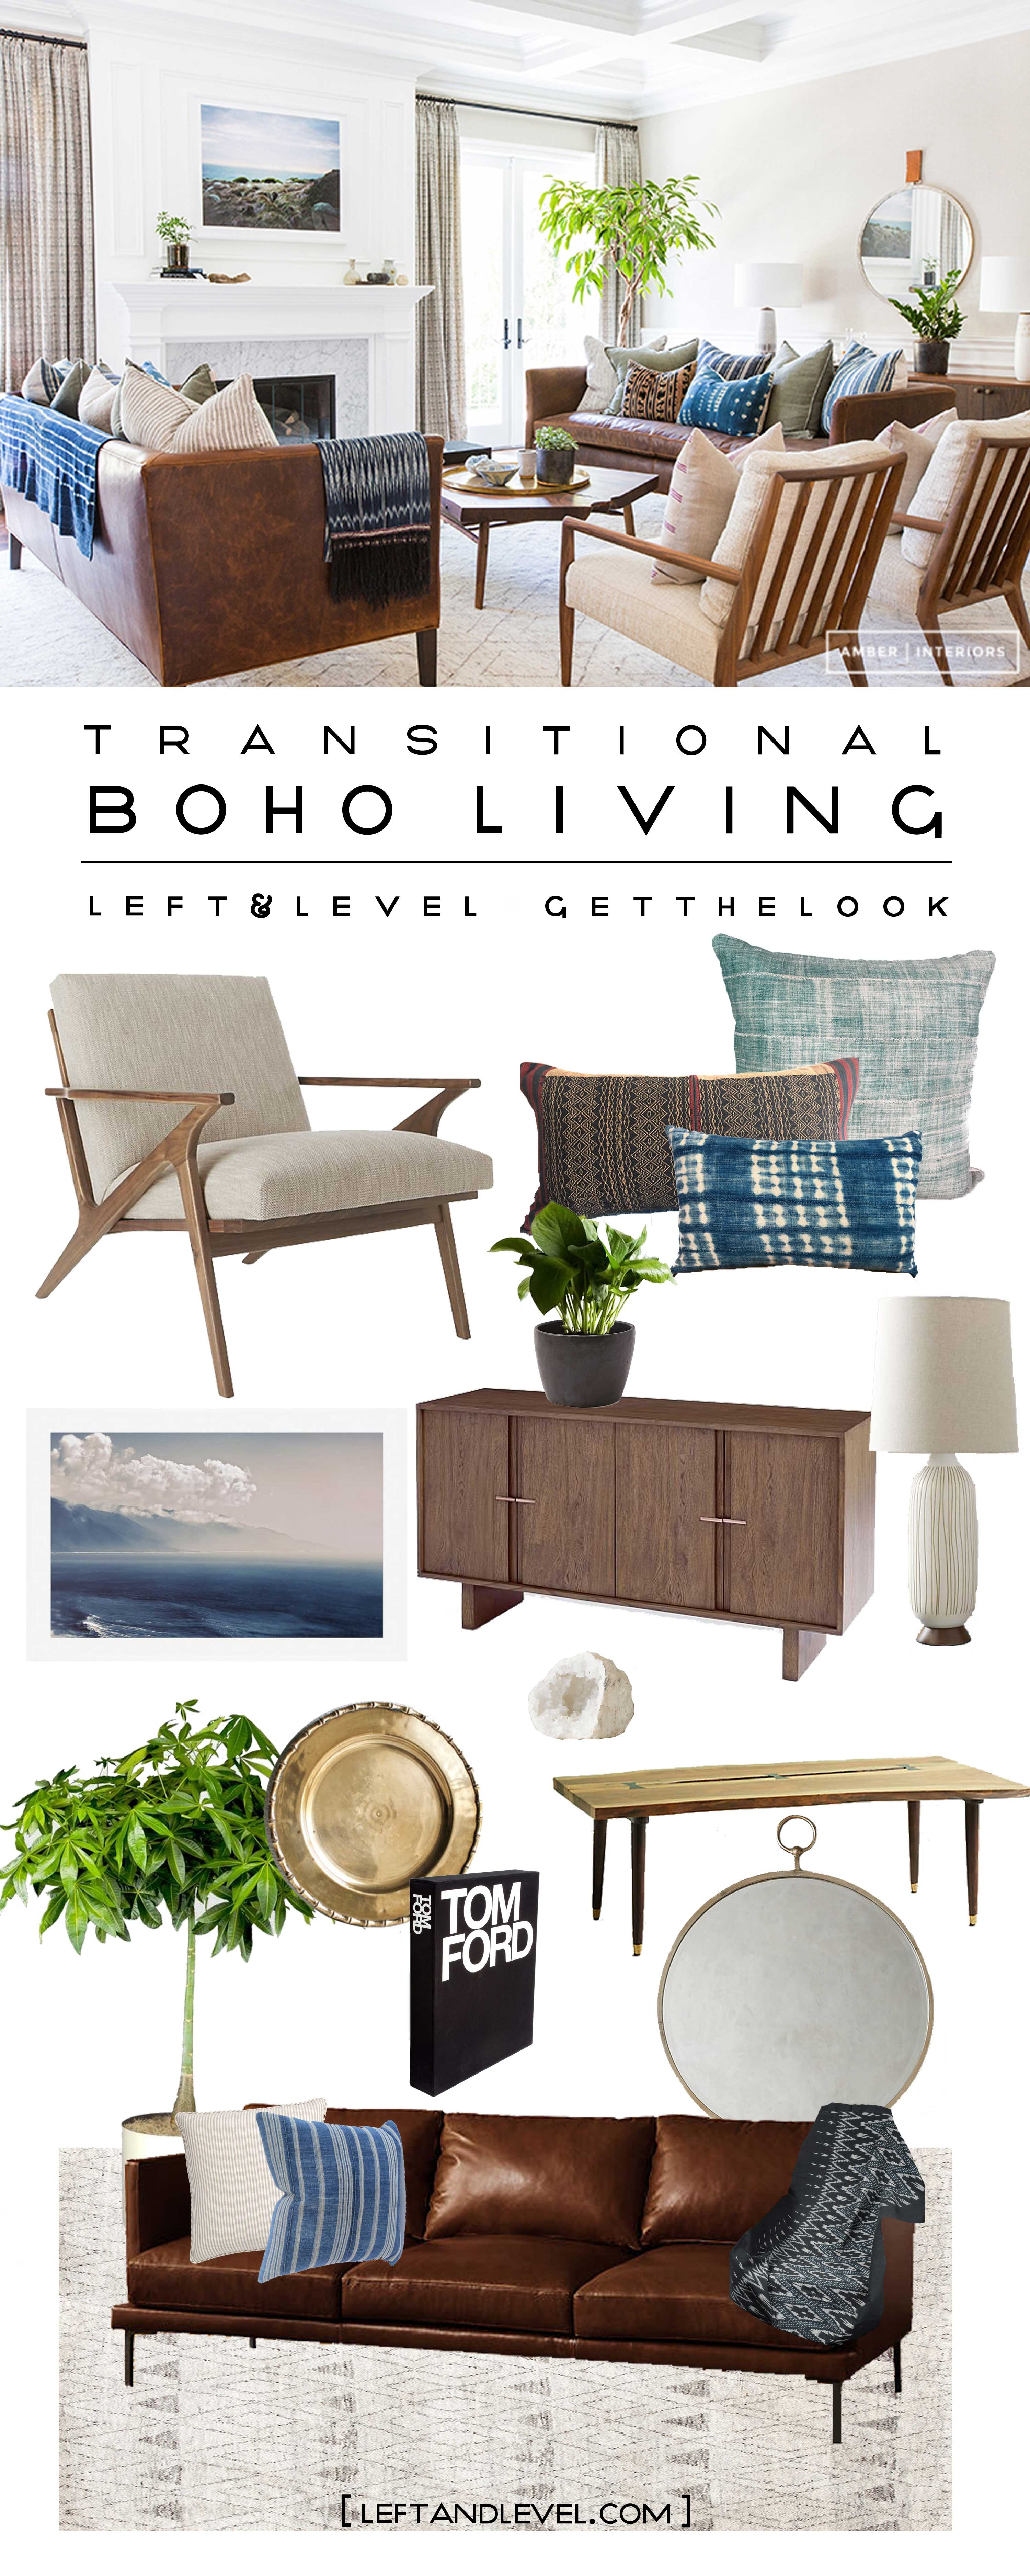 Transitional Boho Living | Get the Look - Left & Level